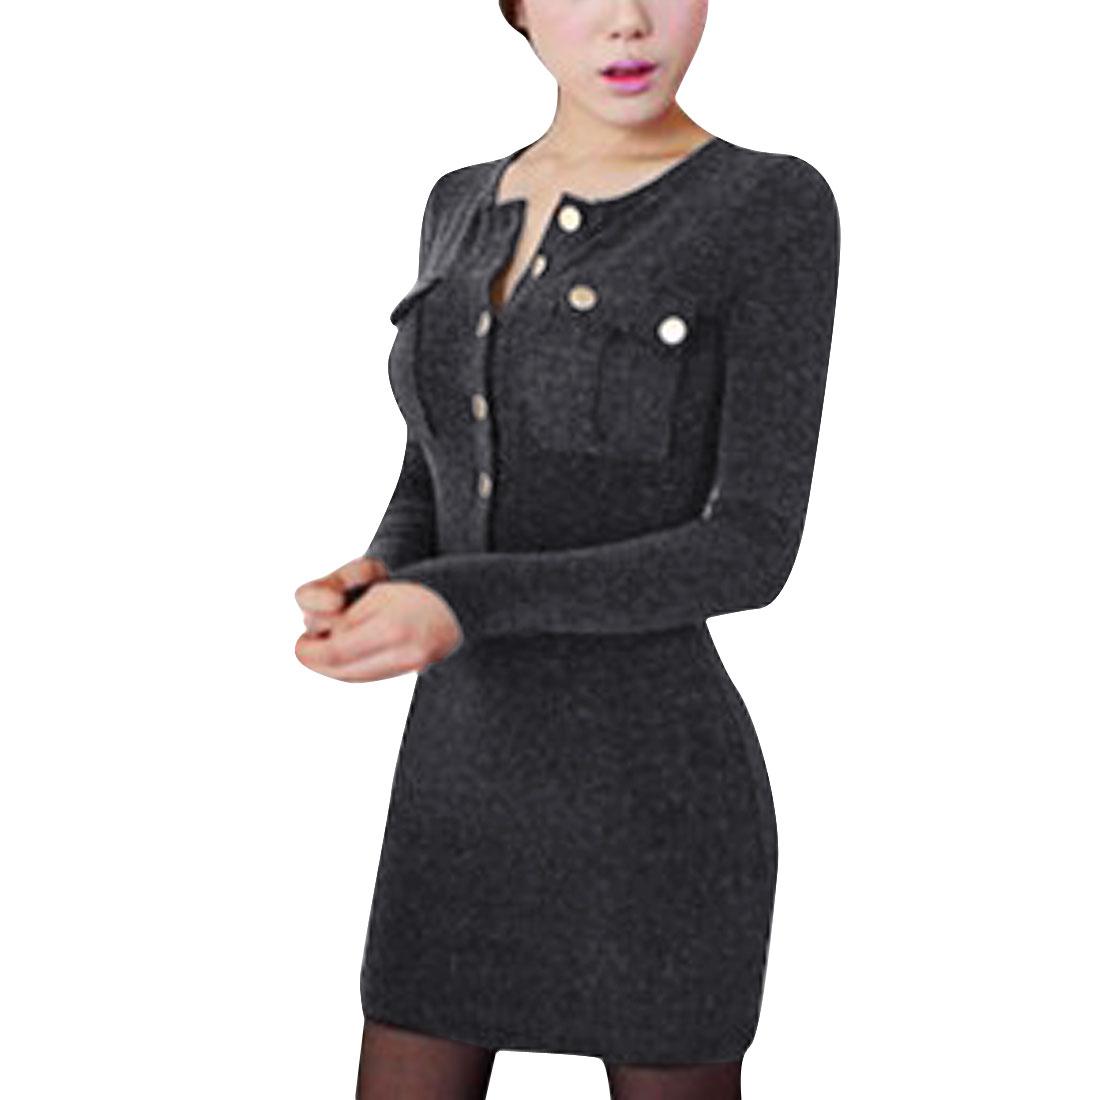 Woman's Fashionable Round Neck Long Sleeves Dark Gray Shirt XS